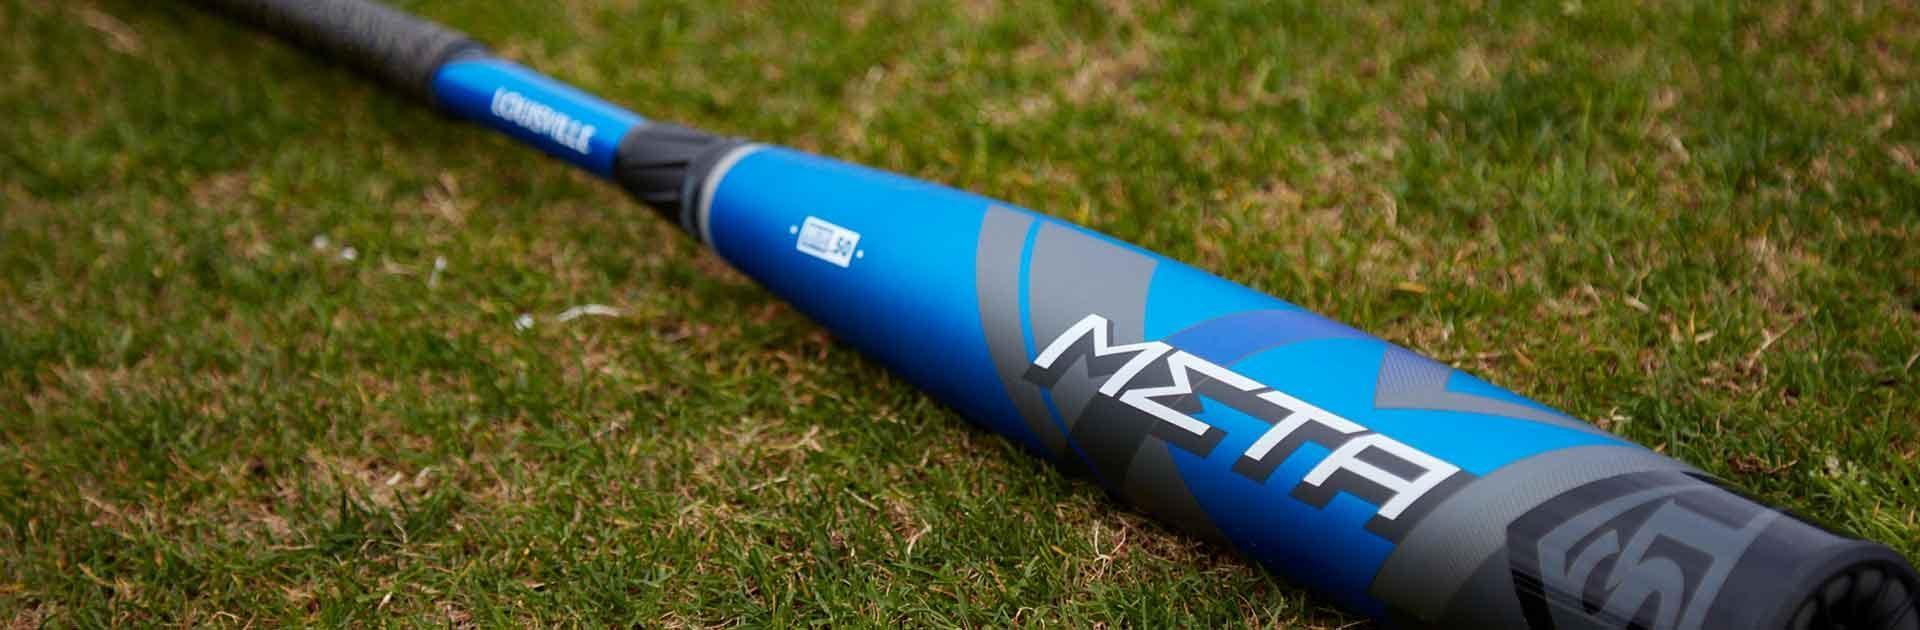 Louisville-Slugger-Meta-BBCOR-Baseball-Bat-2020